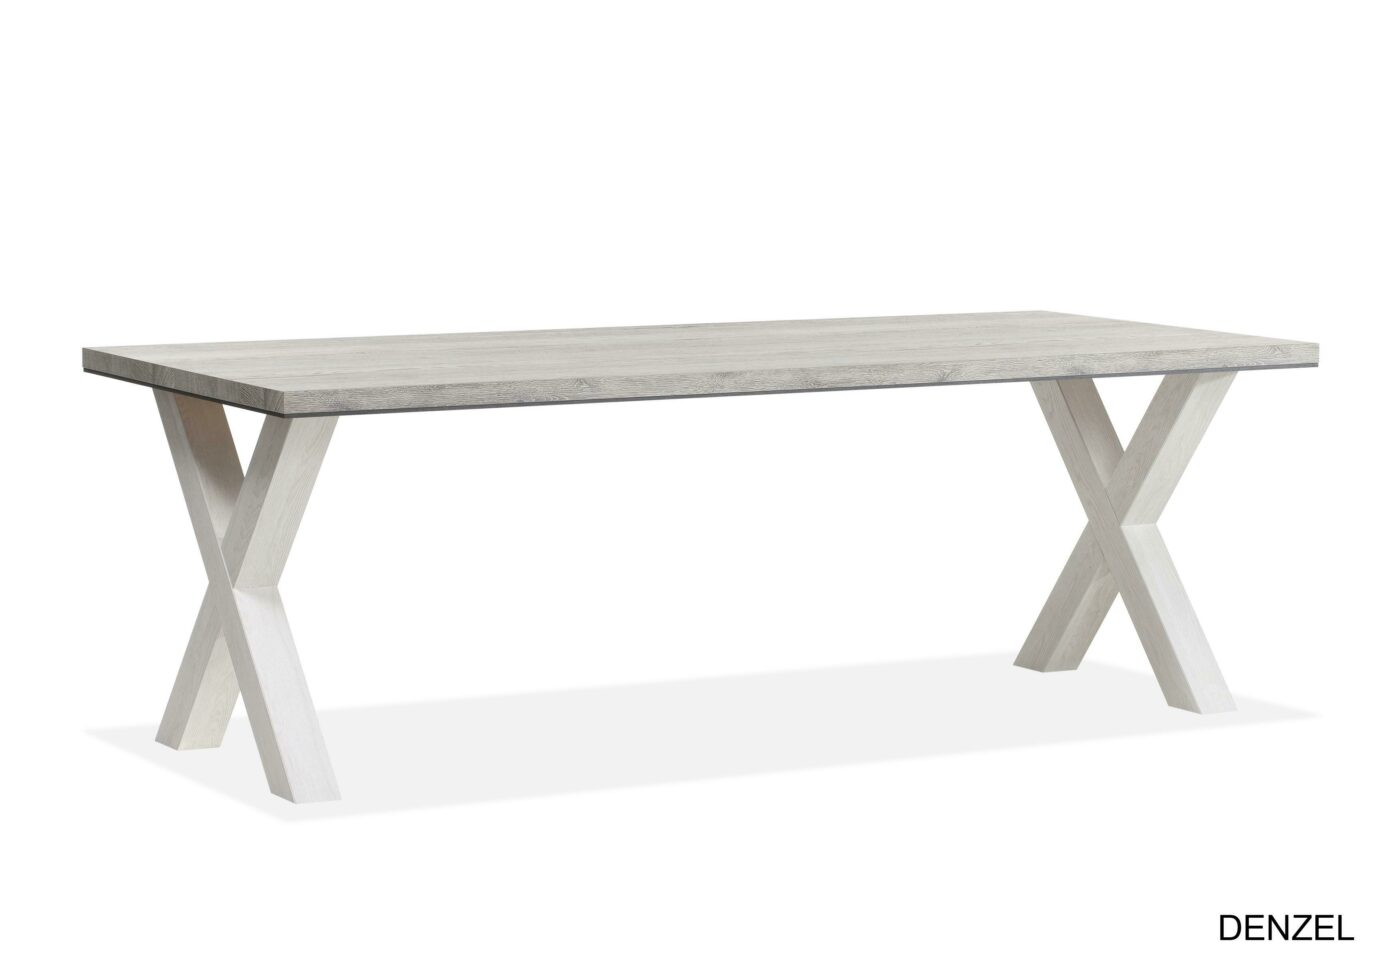 Denzel tafel